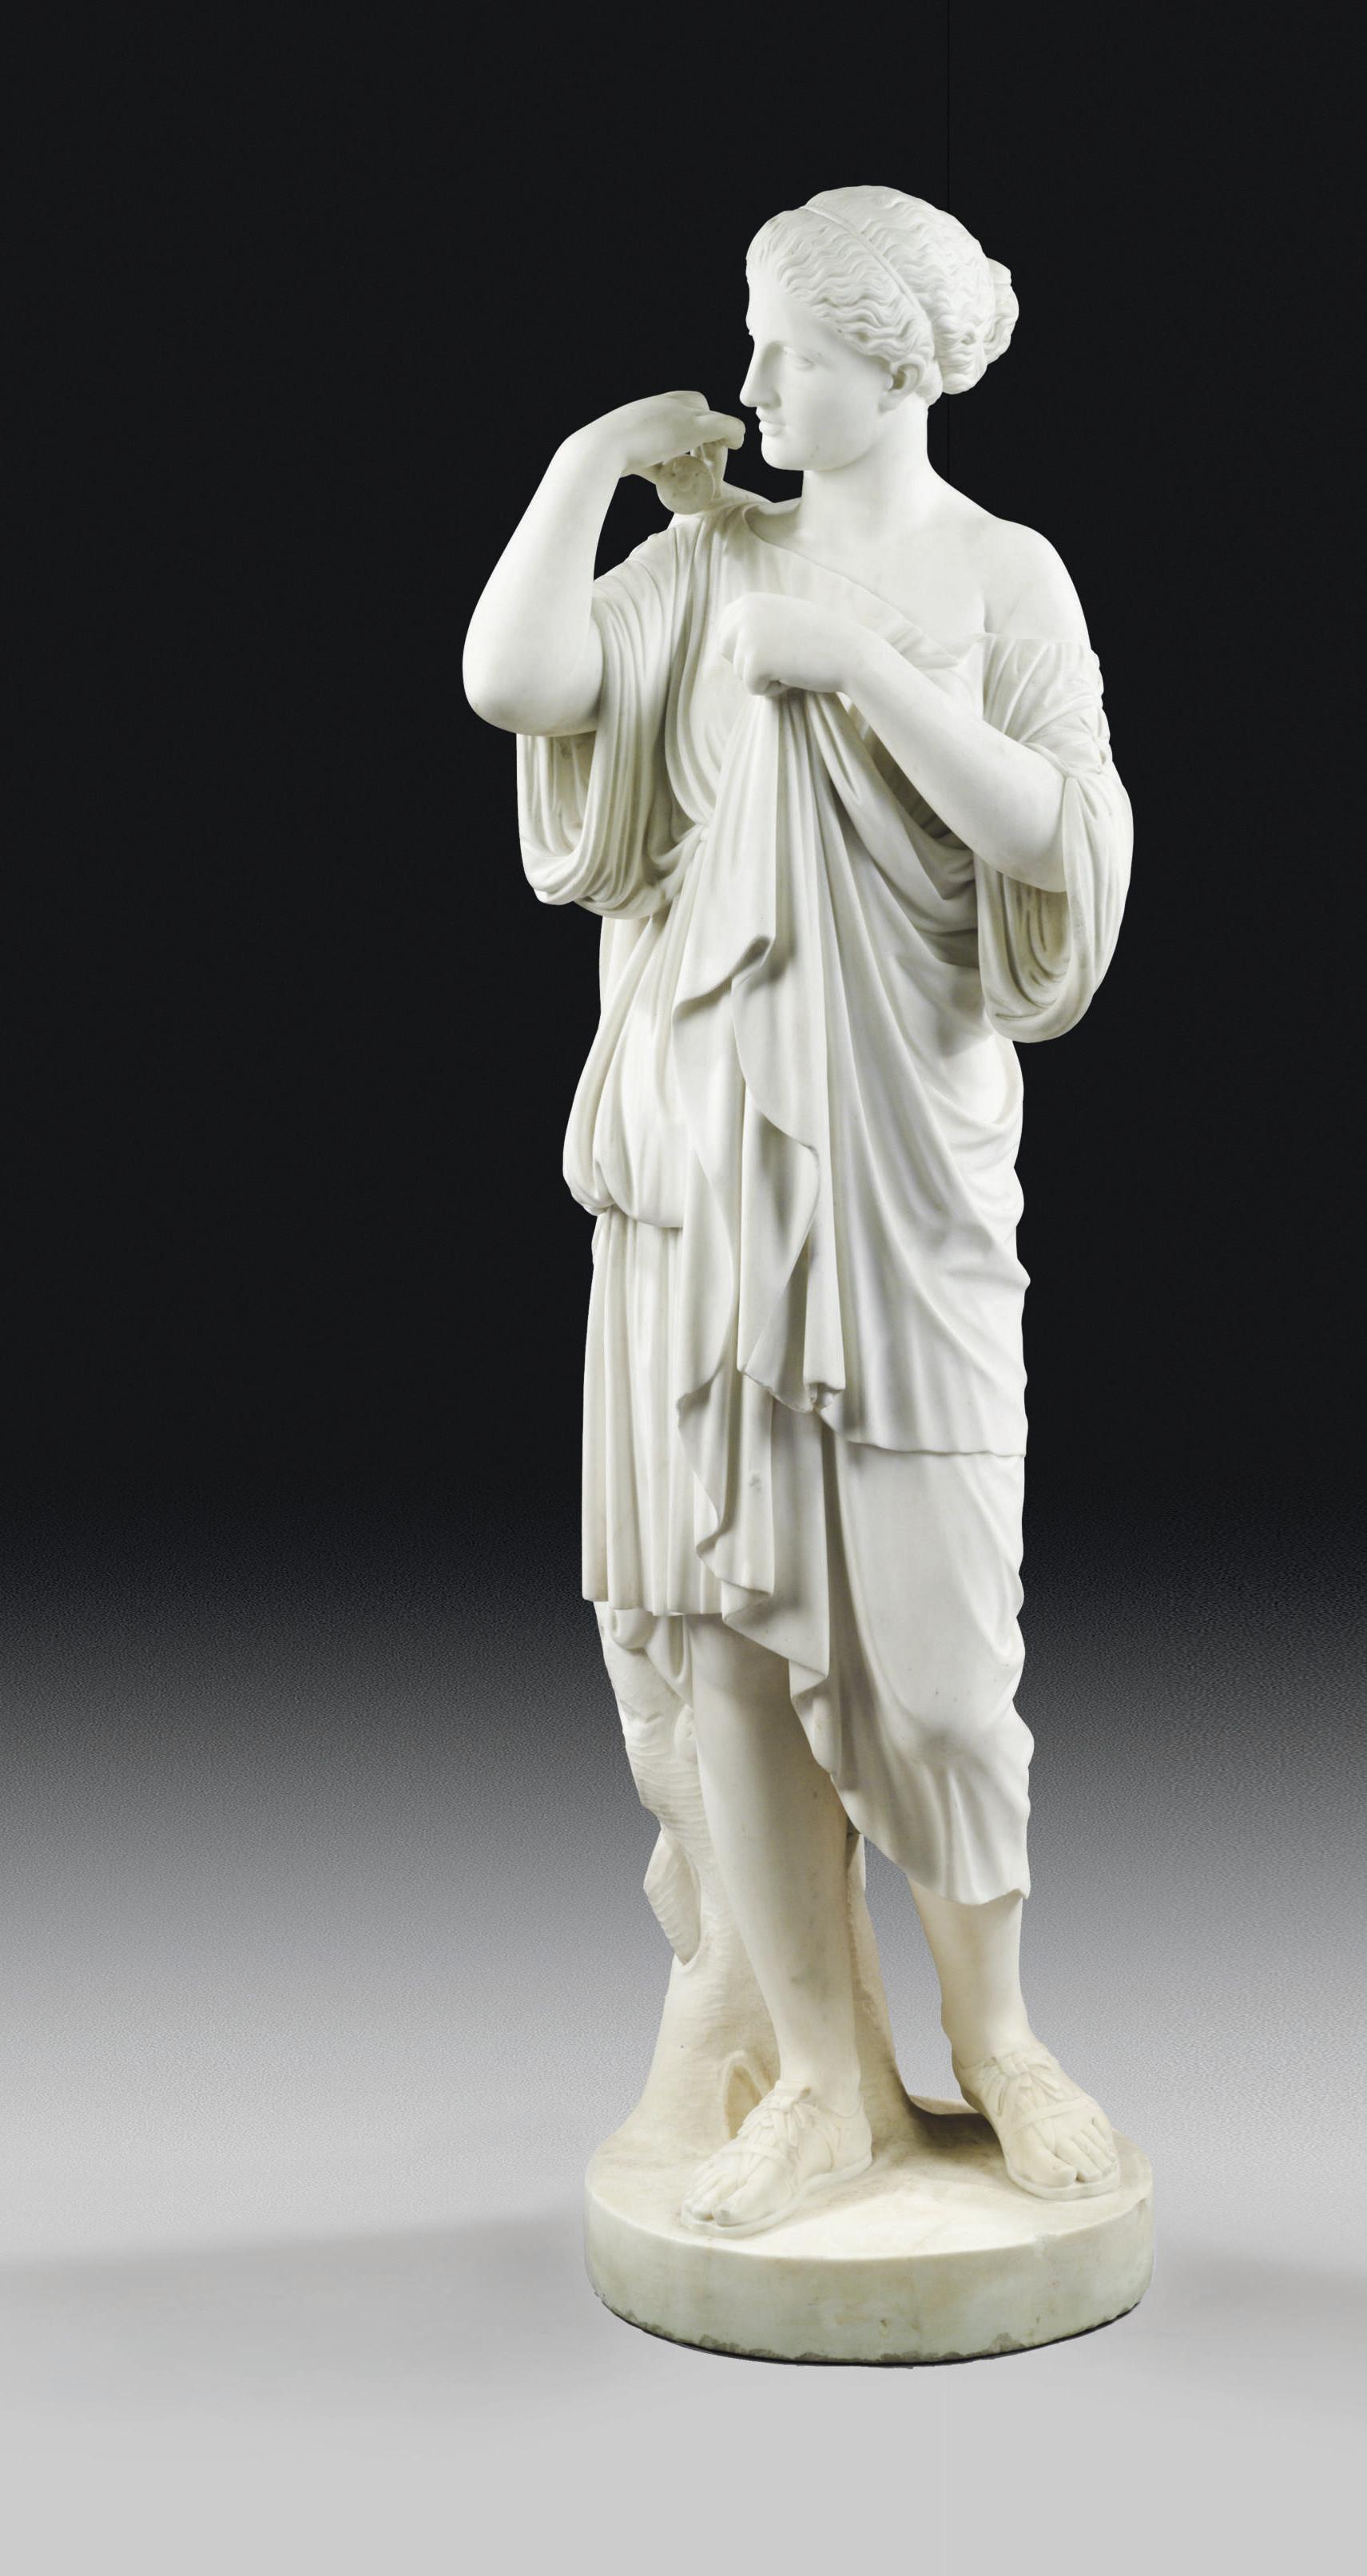 AN ITALIAN WHITE MARBLE FIGURE OF DIANA OF GABIES